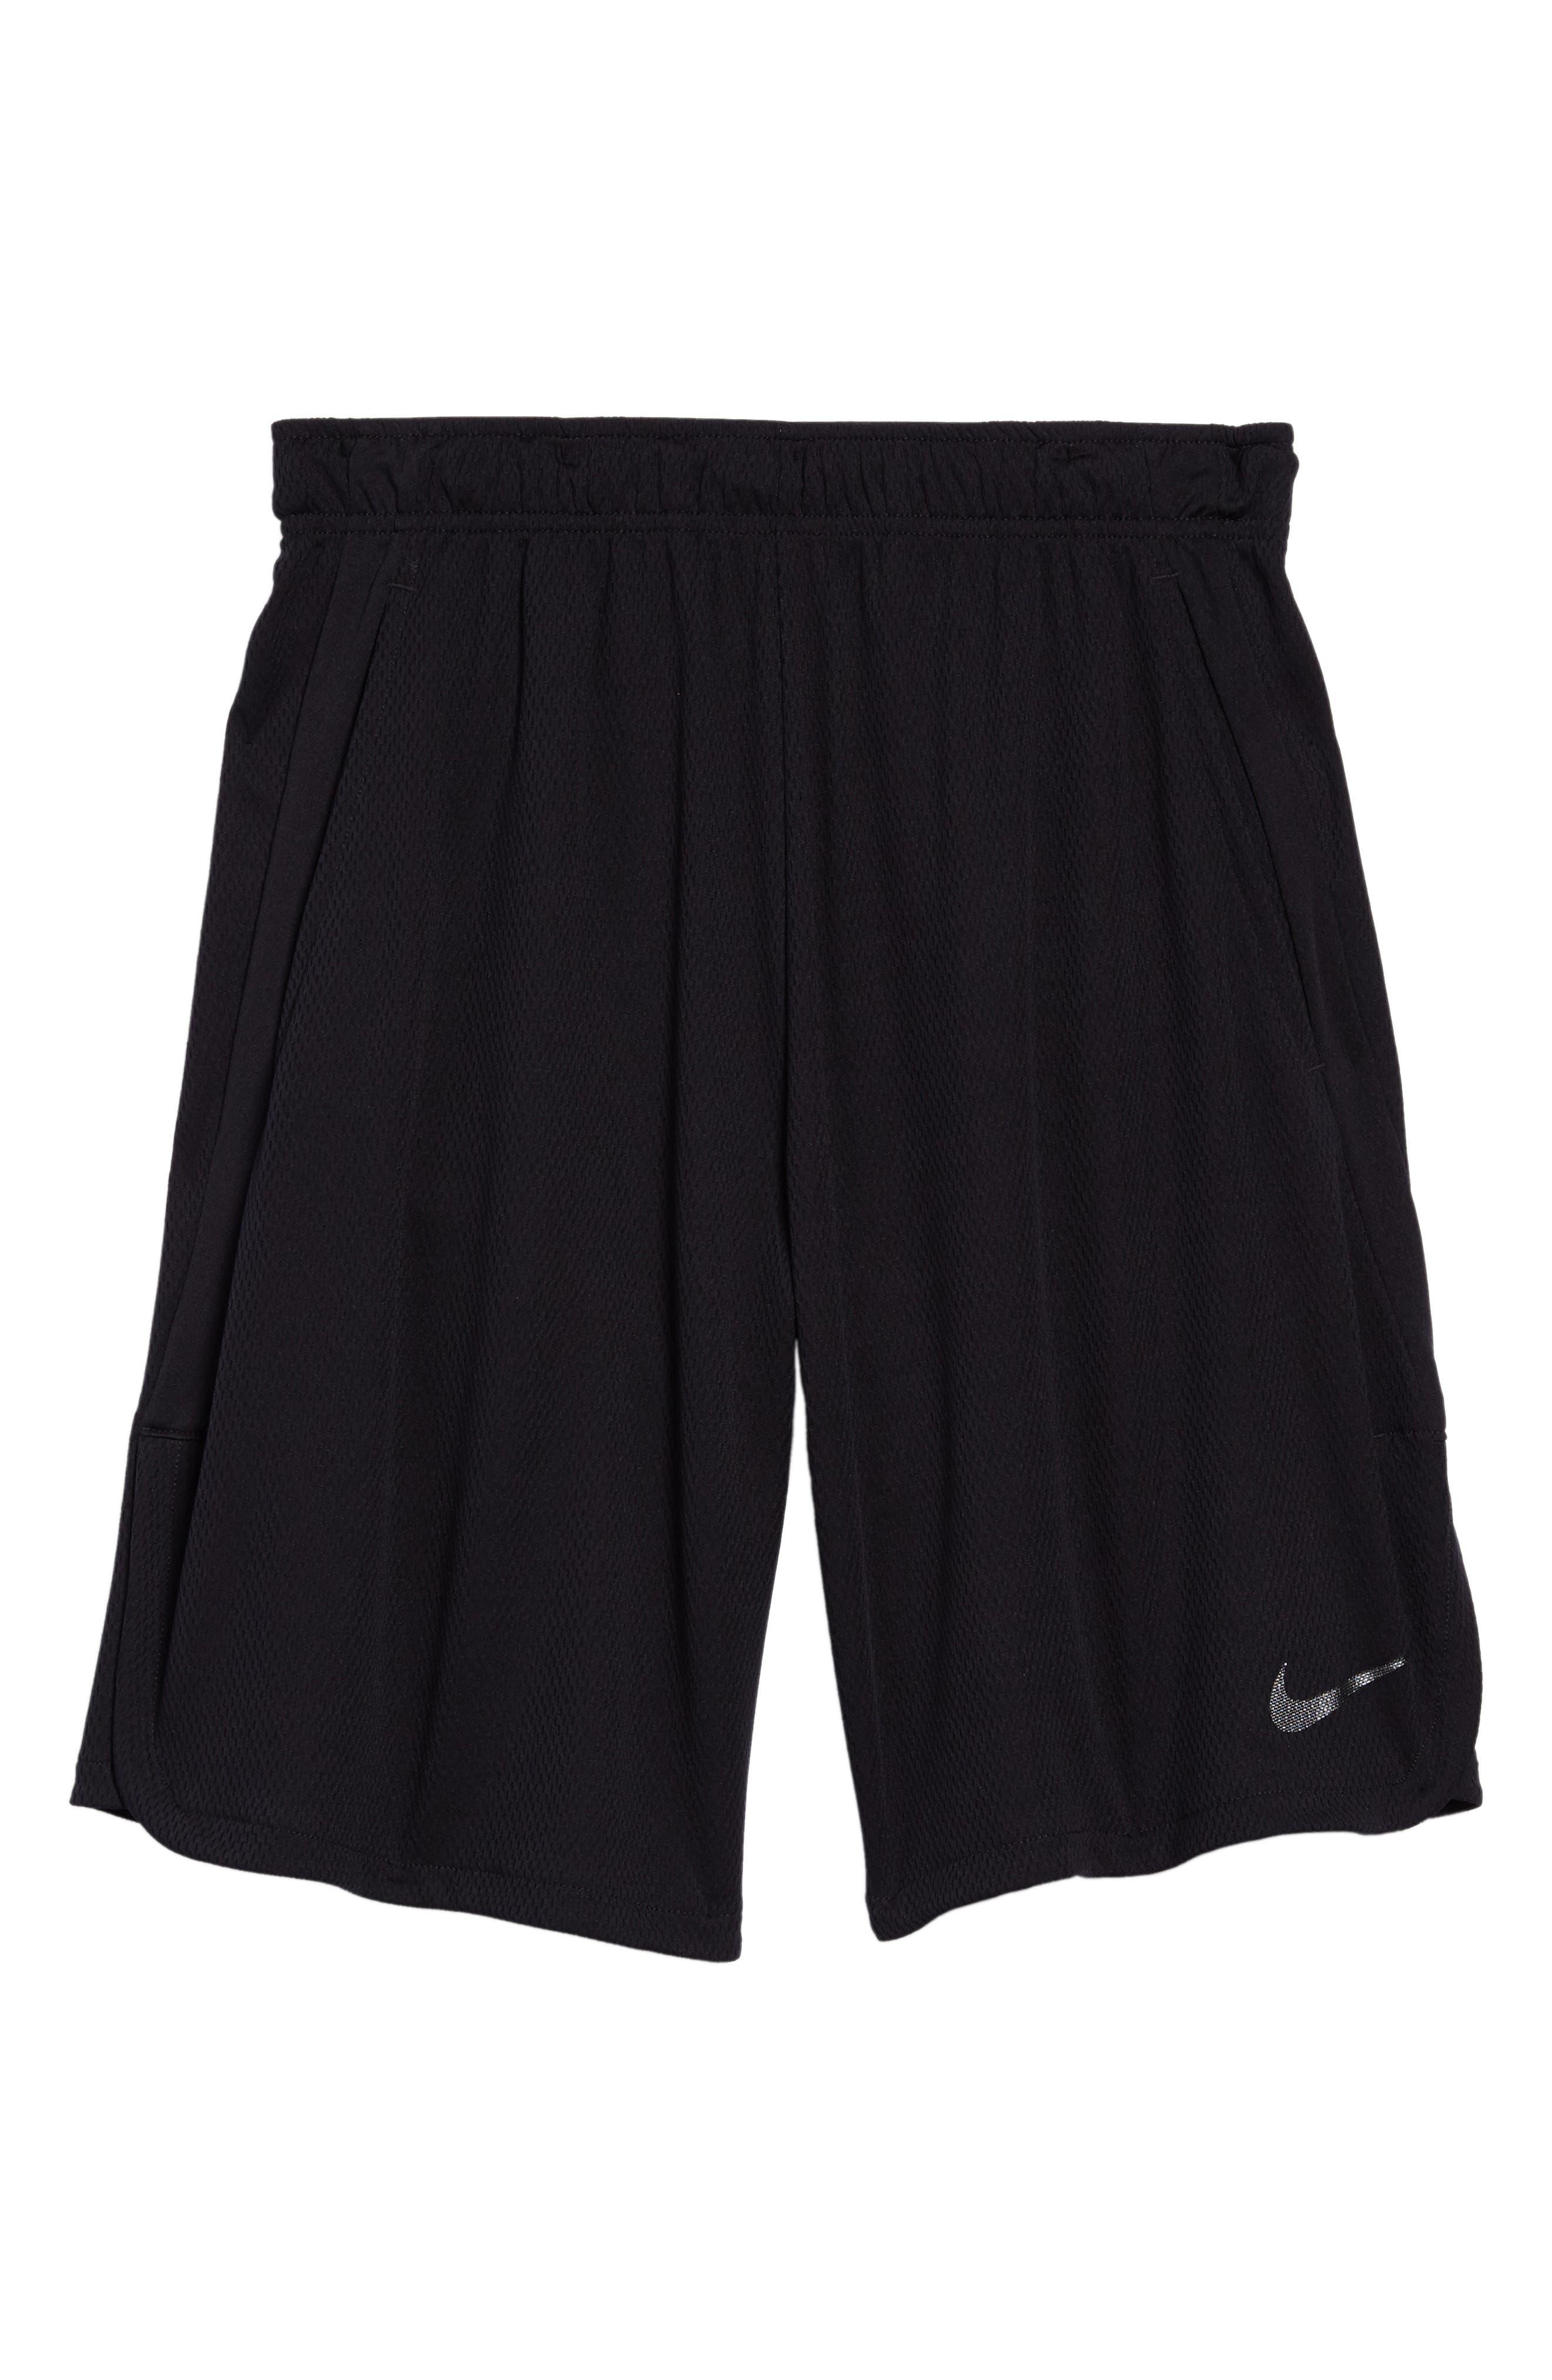 Training Dry 4.0 Shorts,                             Alternate thumbnail 6, color,                             010